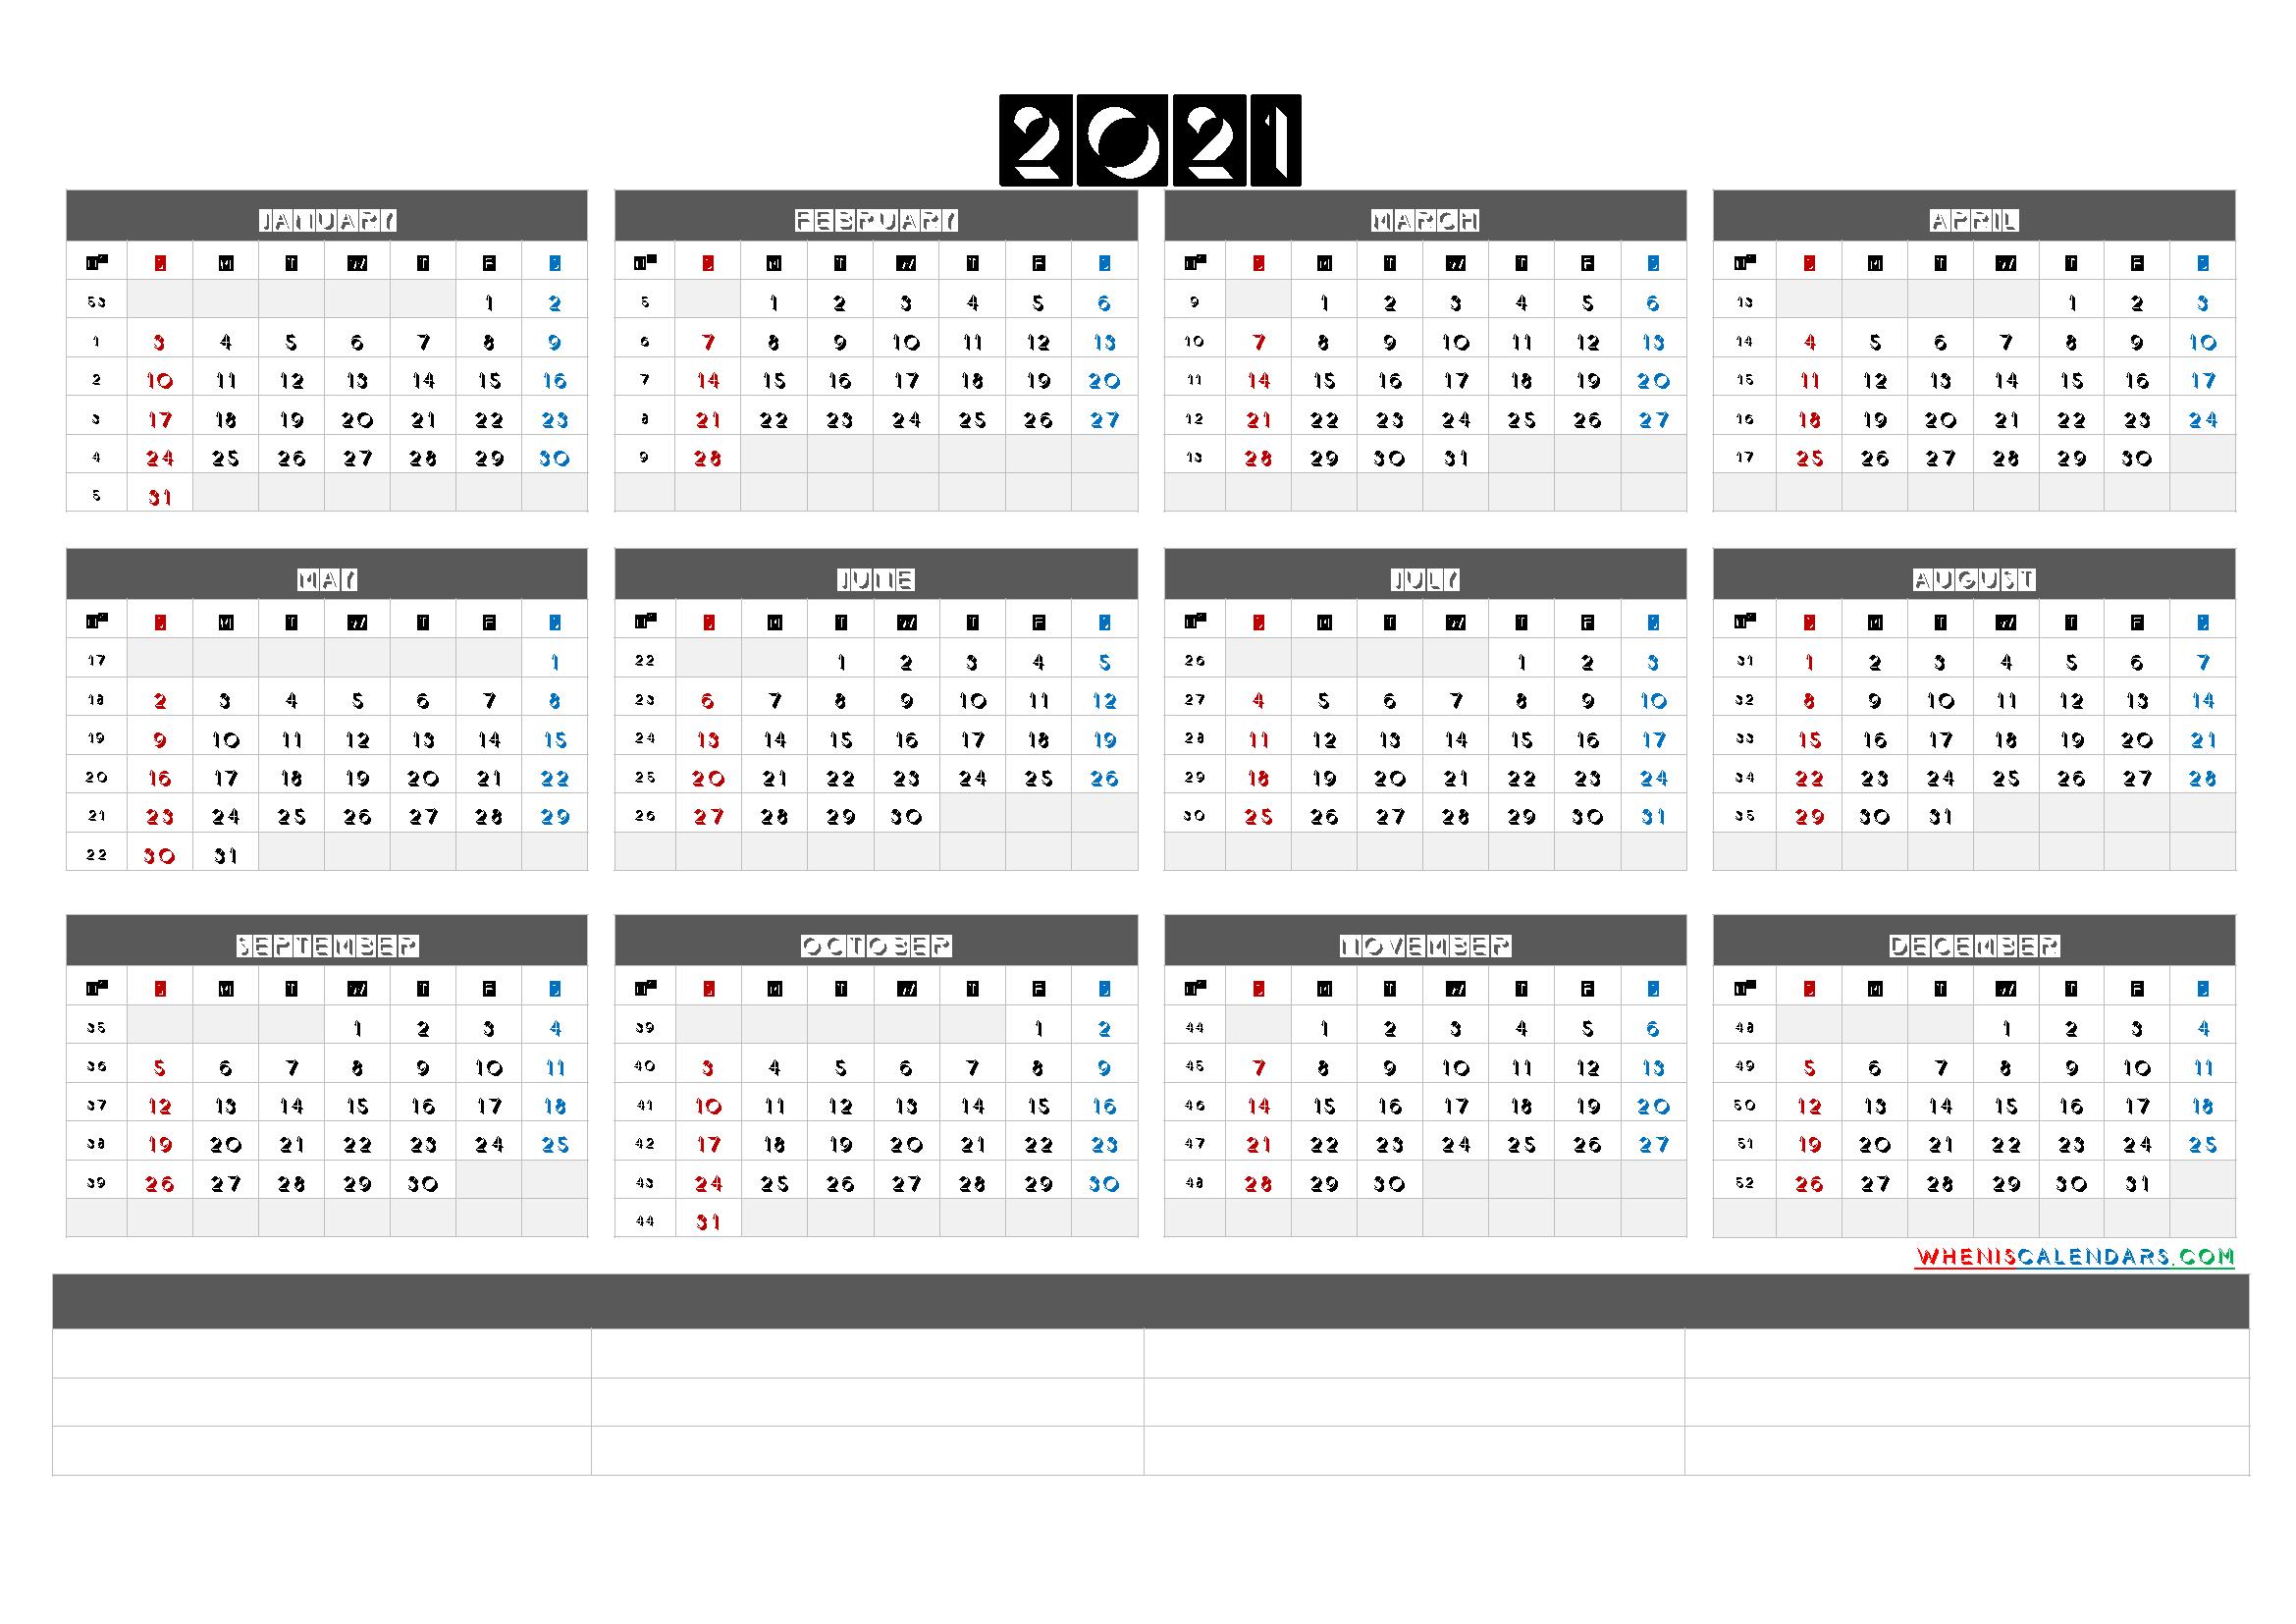 Free Printable 2021 Yearly Calendar With Week Numbers (6